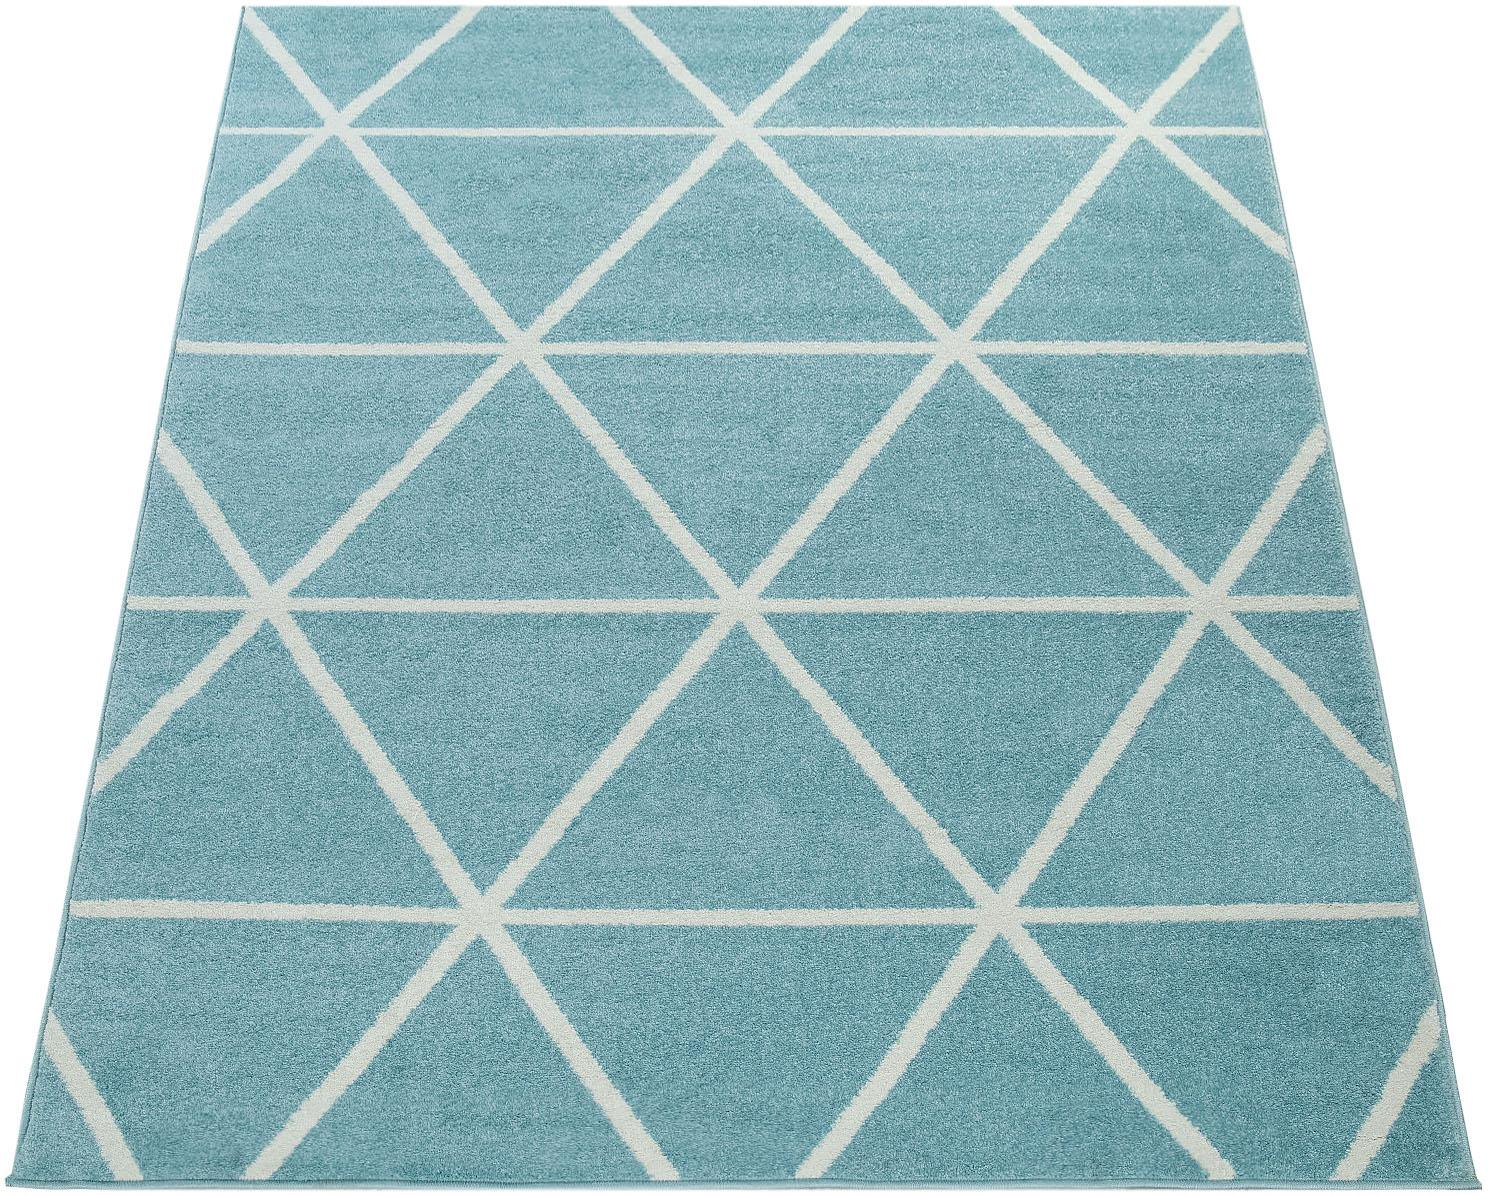 Teppich Stella 401 Paco Home rechteckig Höhe 17 mm maschinell gewebt